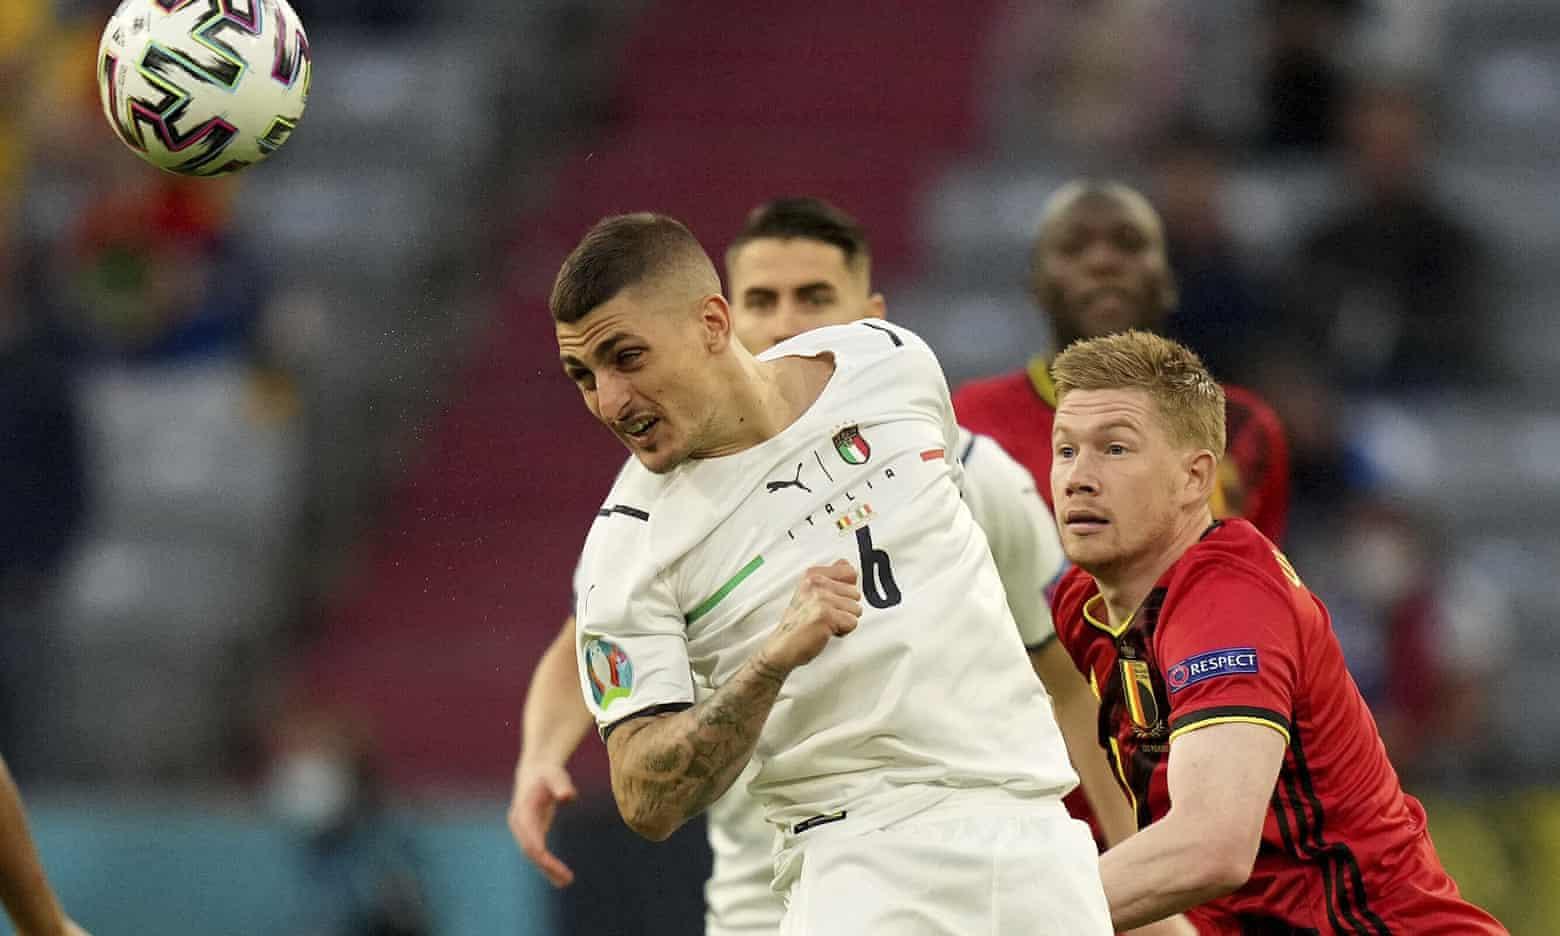 Verratti berselisih dengan De Bruyne pada awal pertandingan perempat final di Allianz Stadium, Munich pada 2 Juli.  Foto: AP